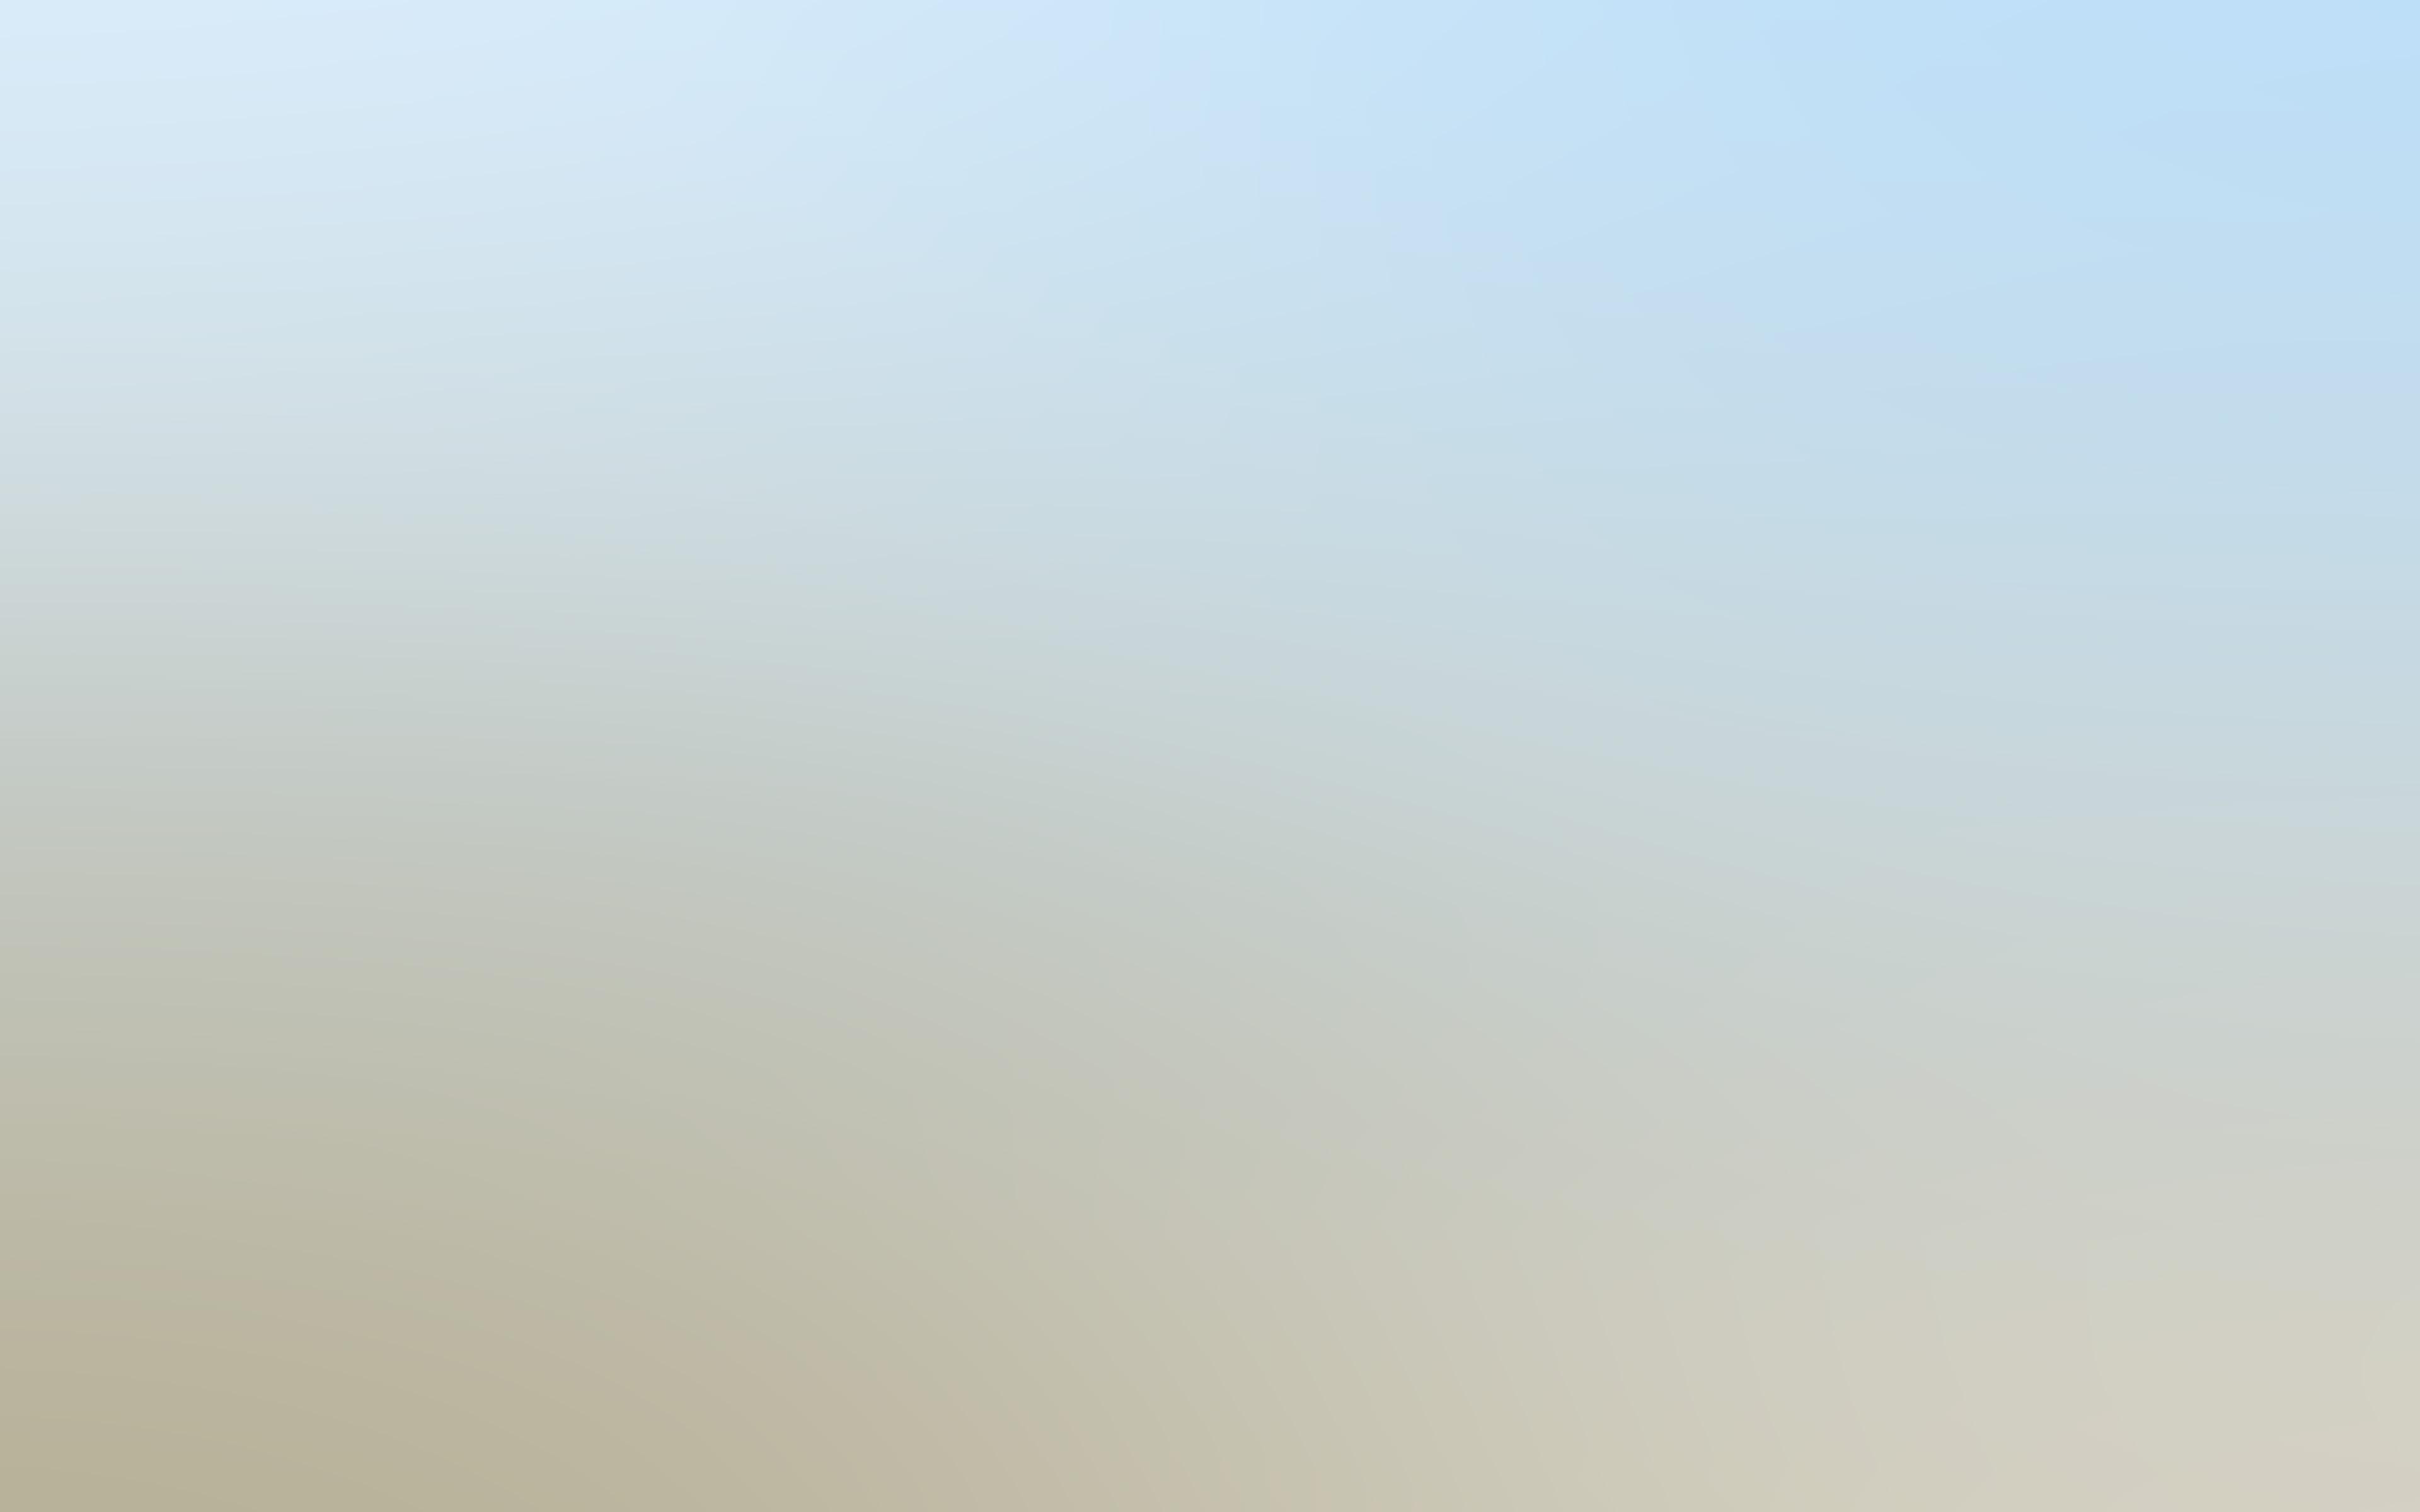 Wallpaper Blue and Brown blur gradient